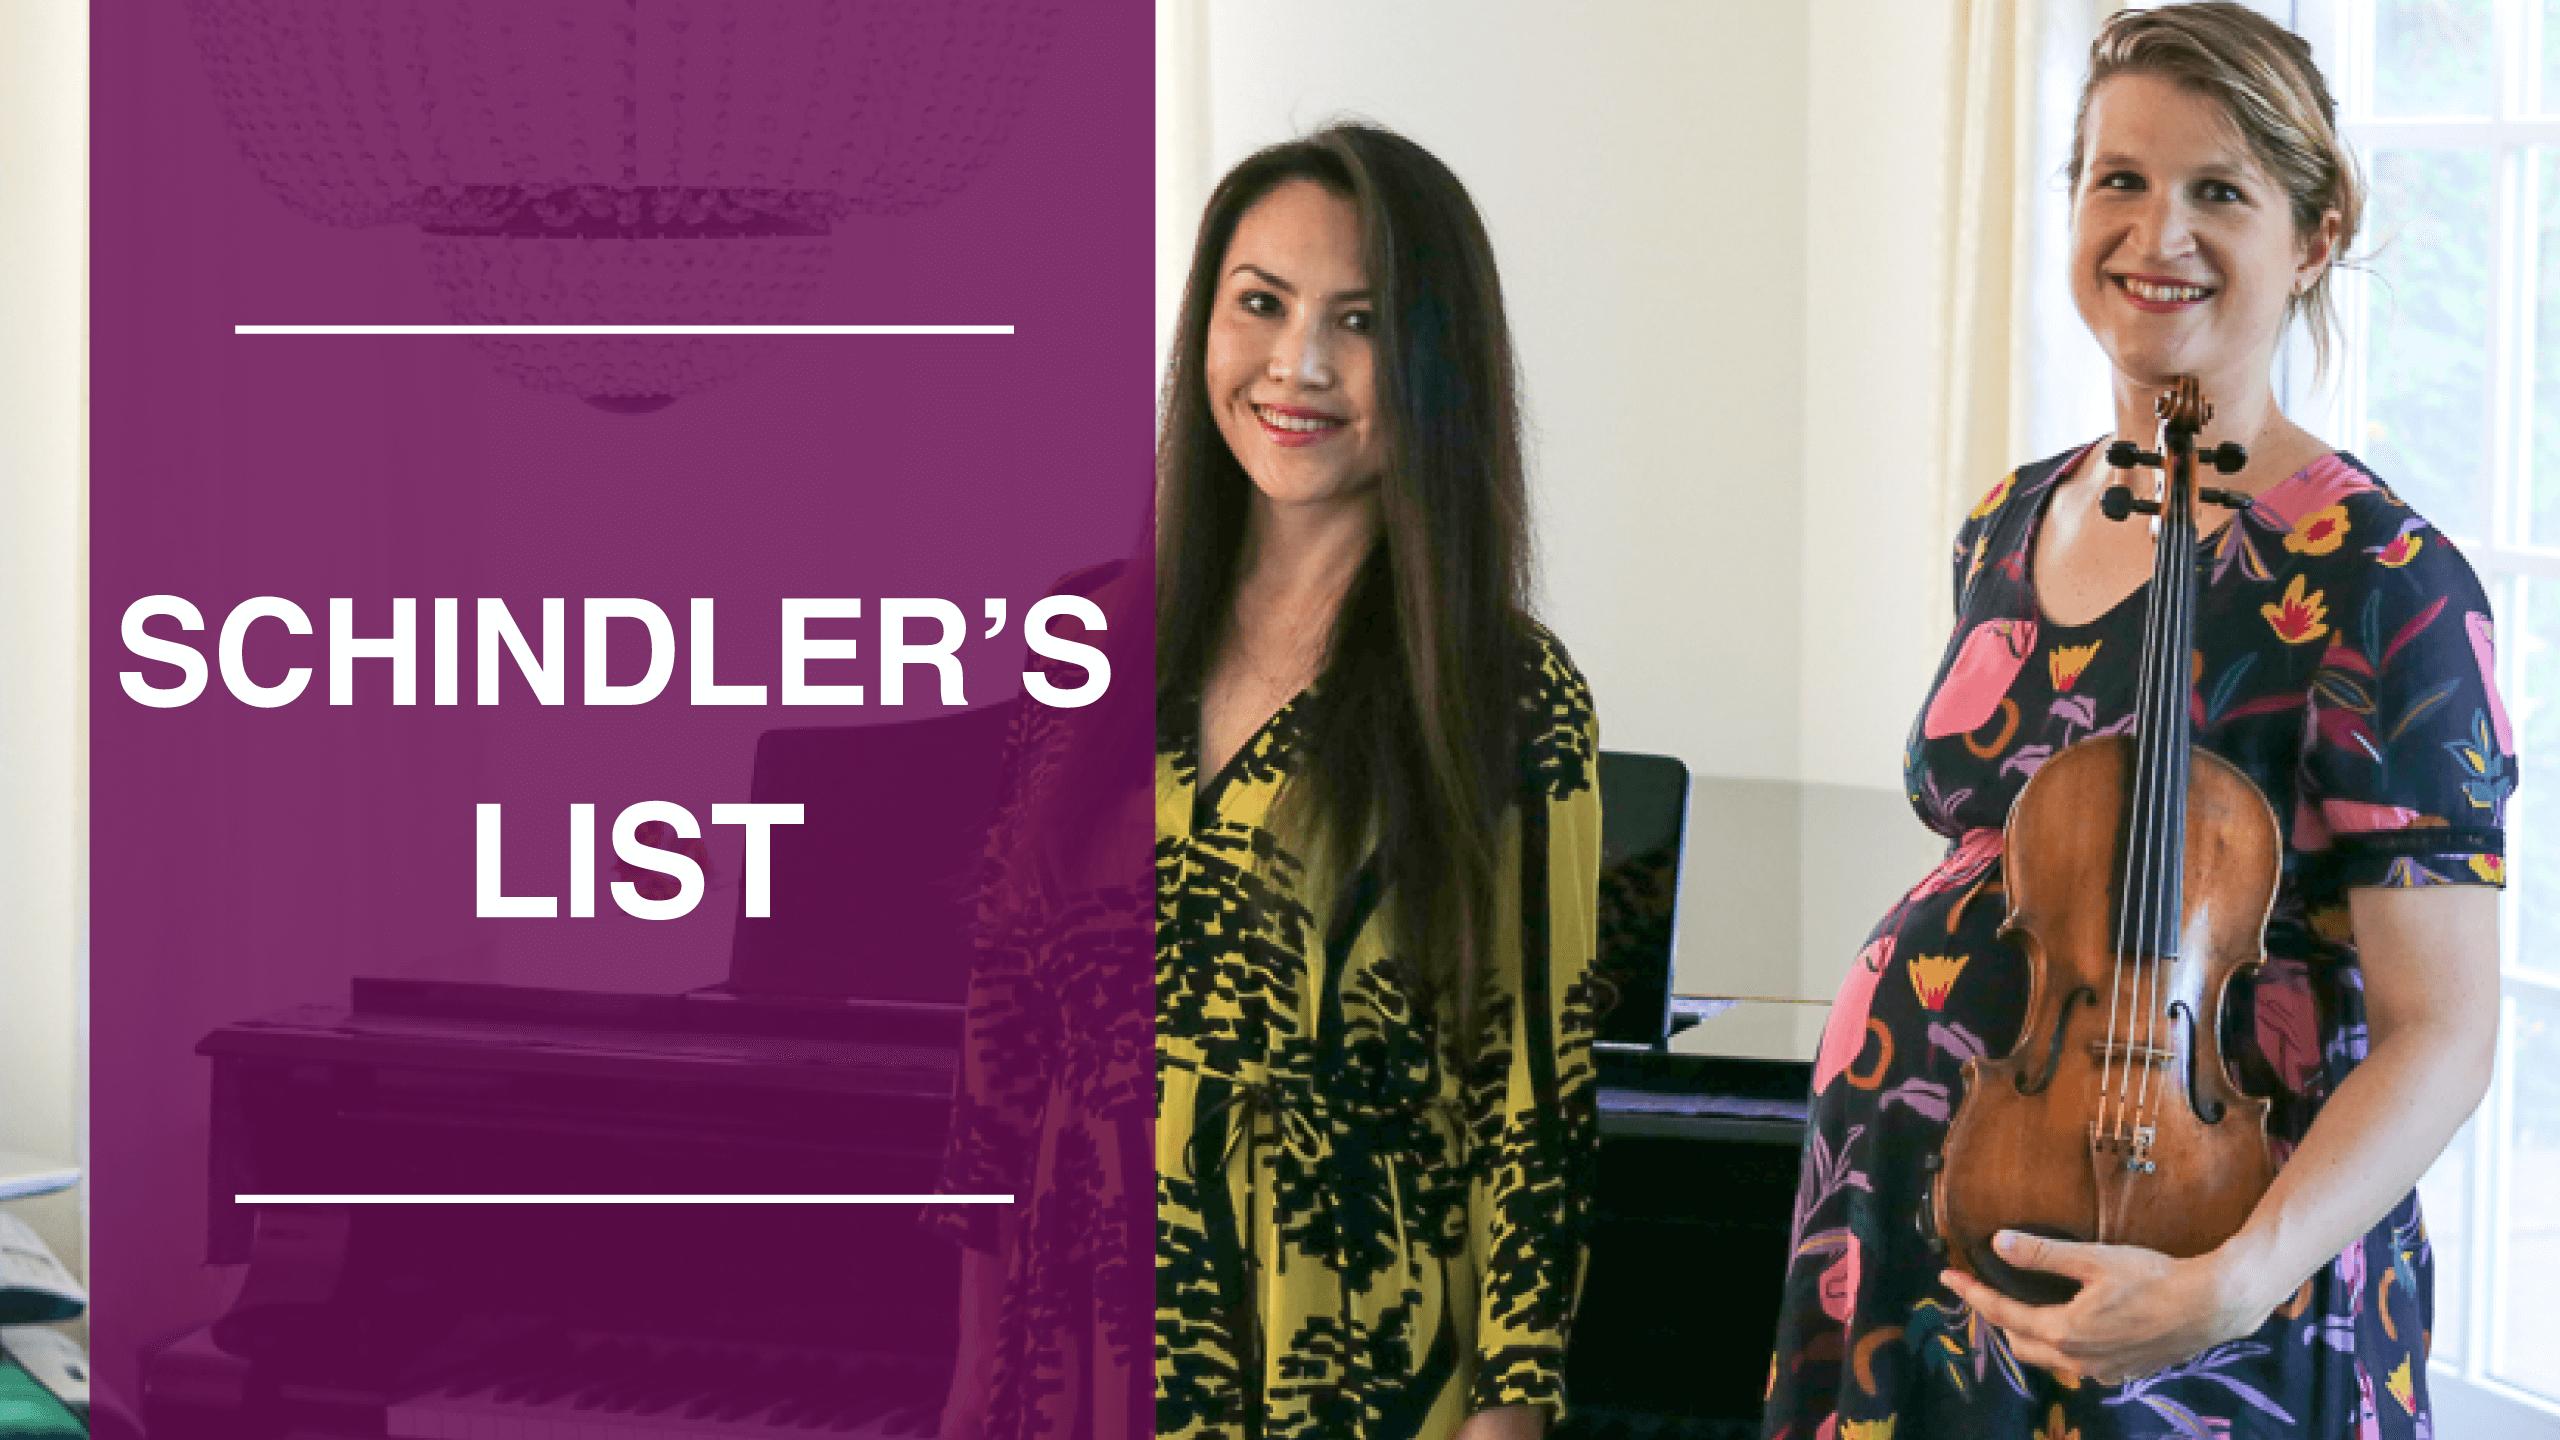 Schindler's List Performance